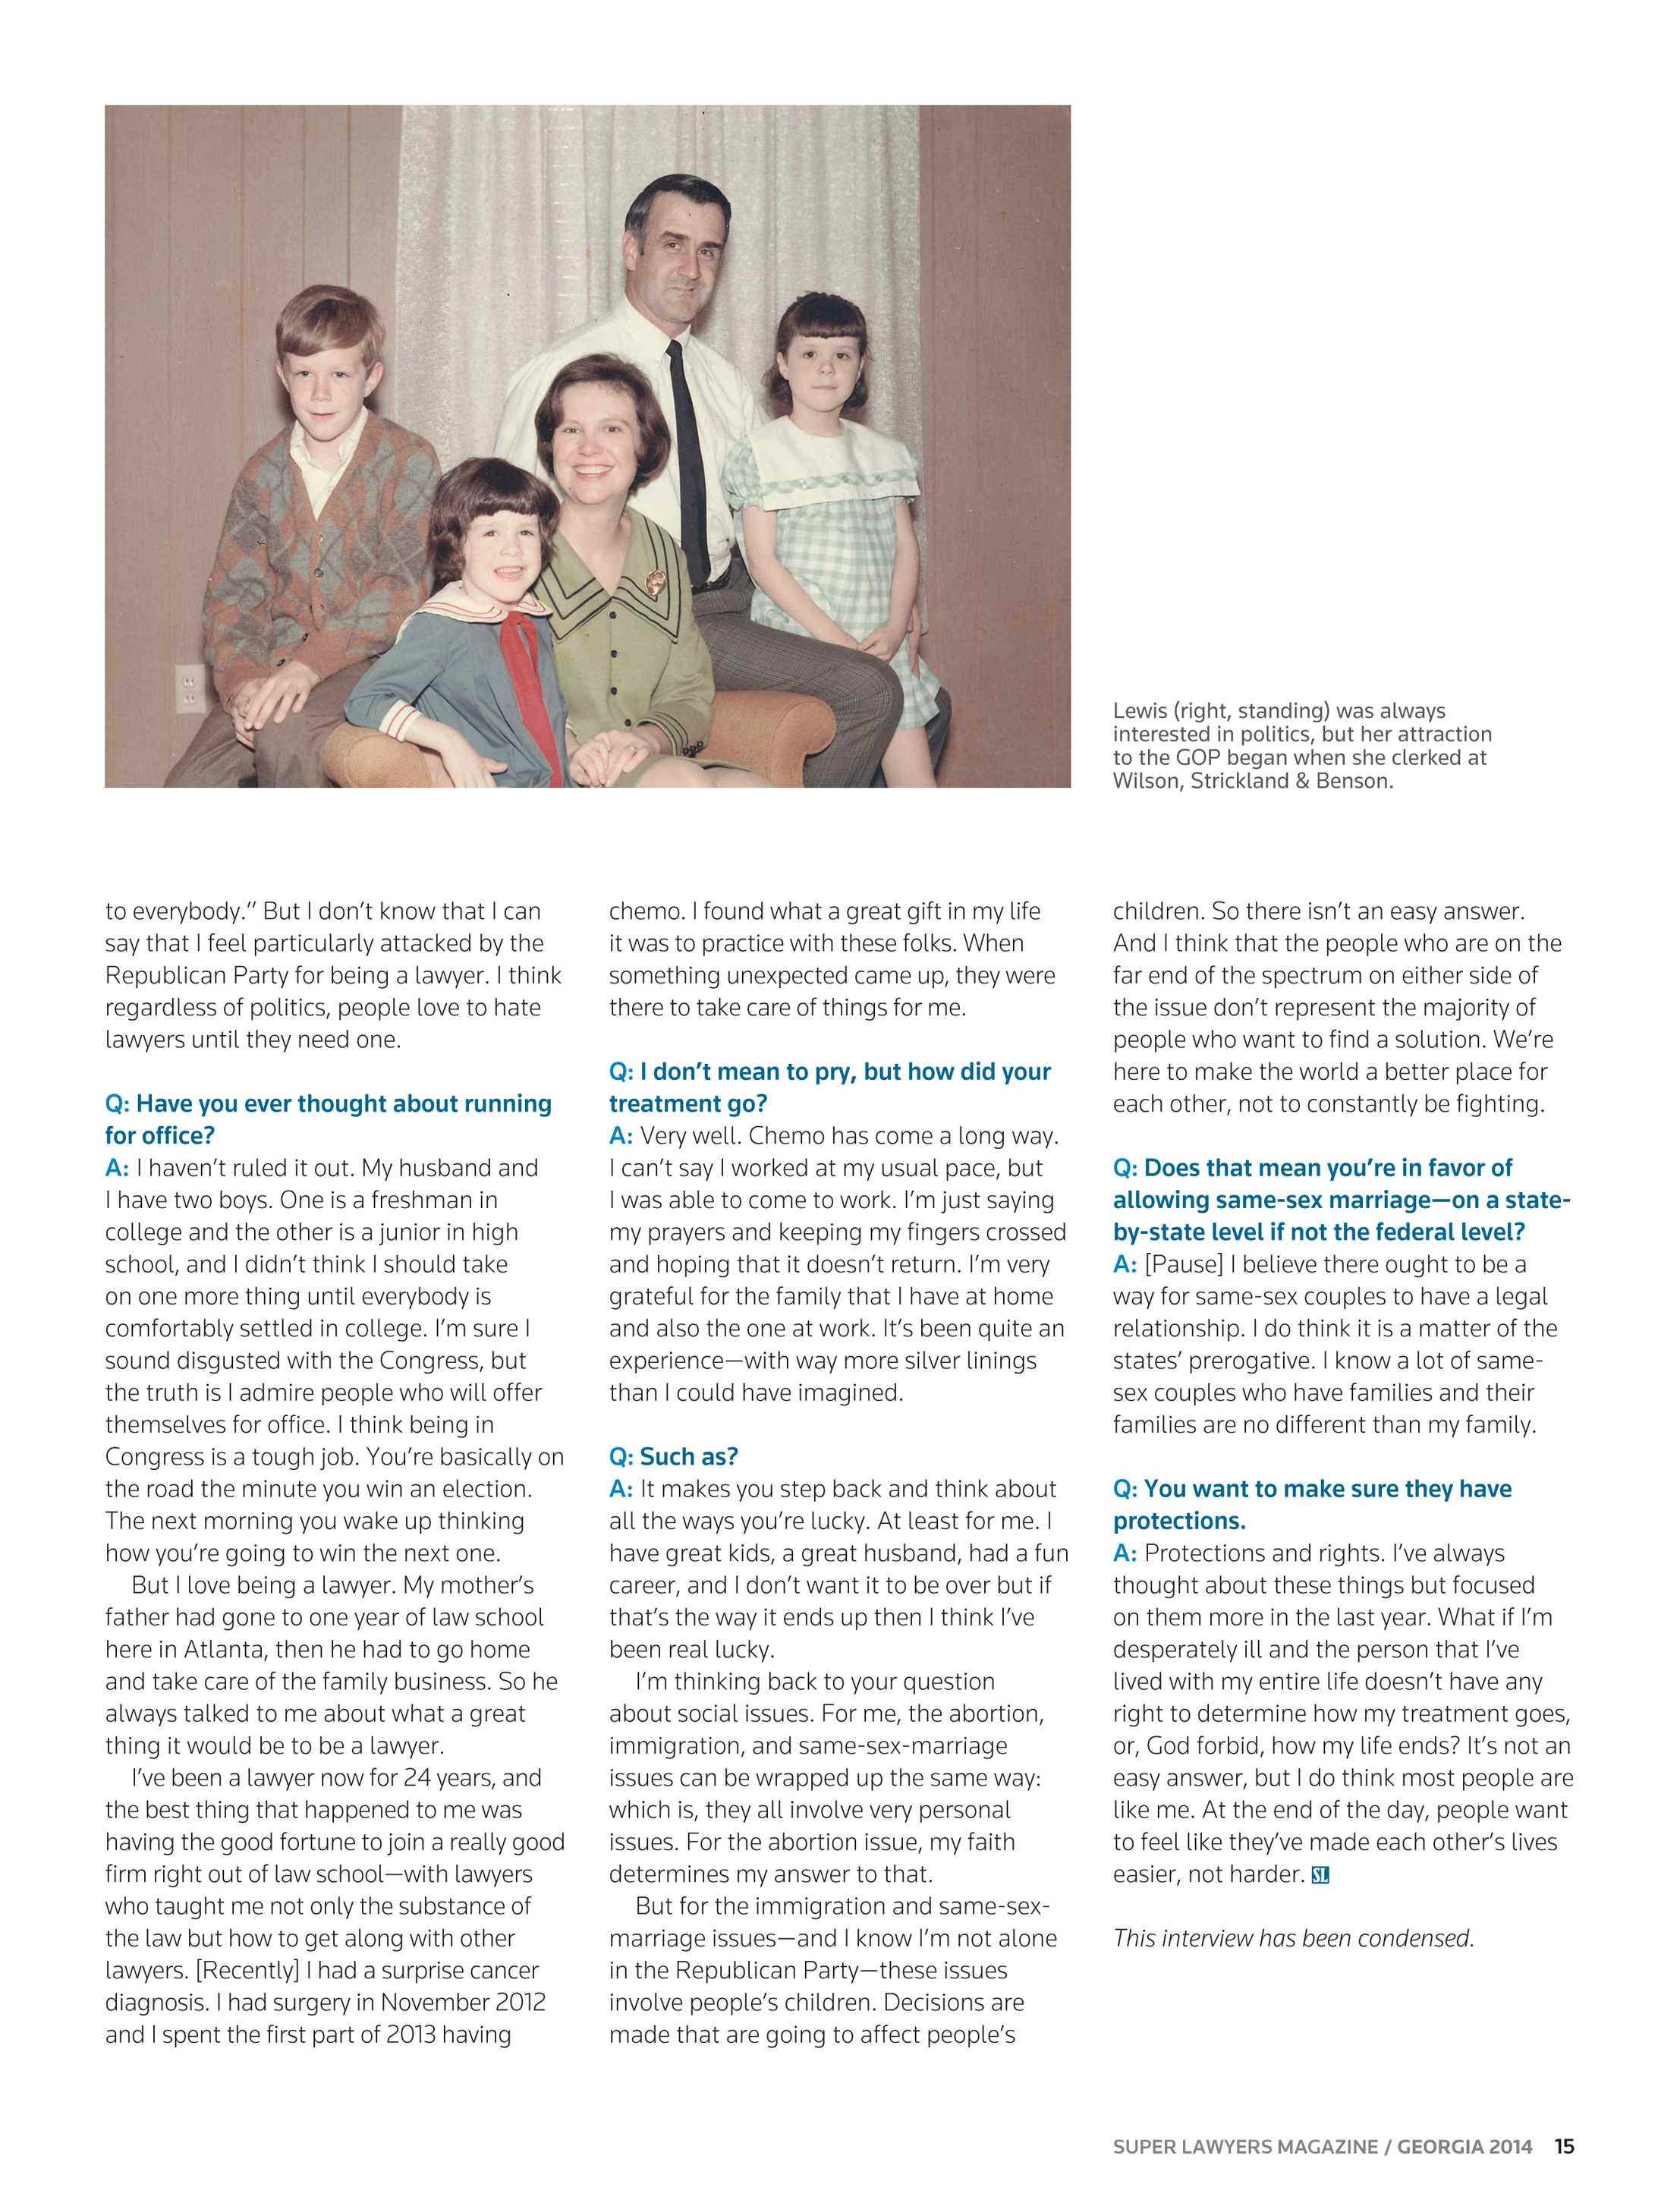 Super Lawyers Georgia 2014 Page 15